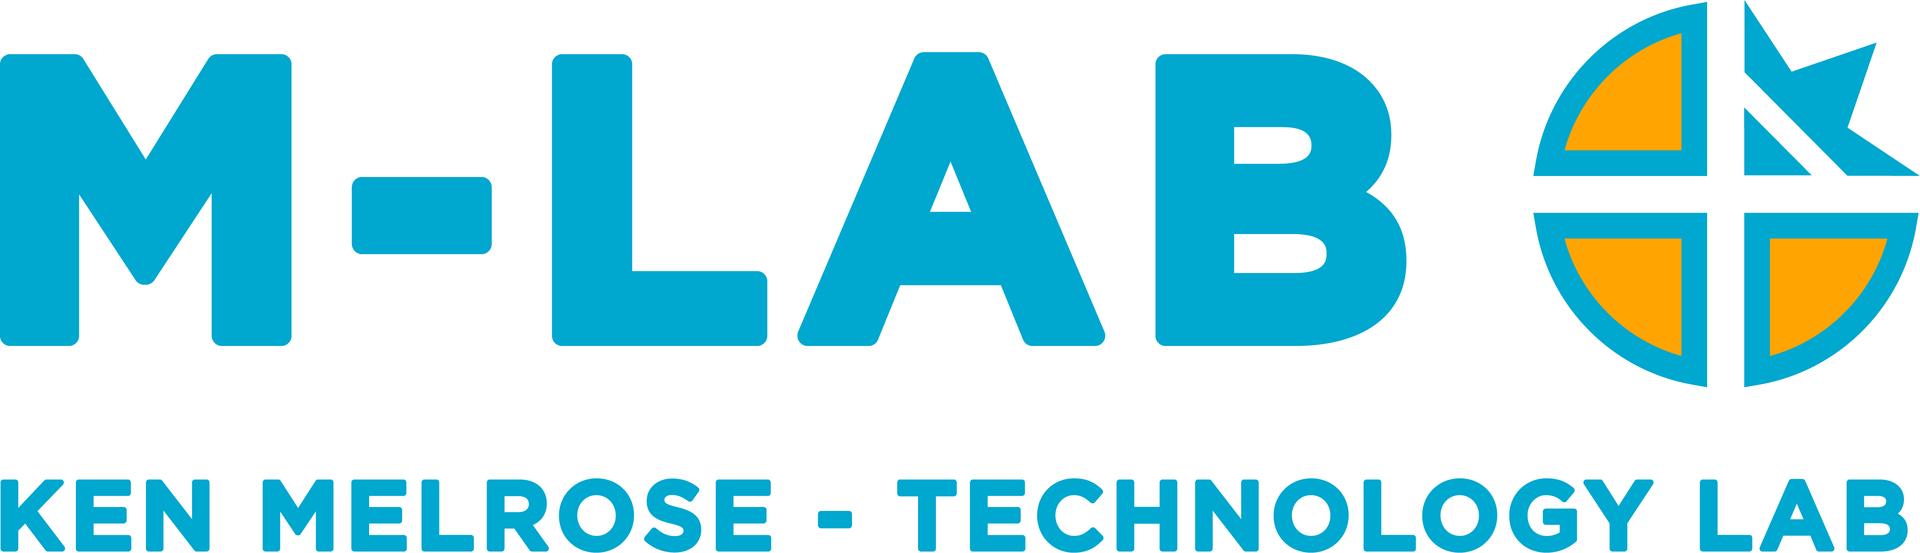 Melrose Technology Lab logo